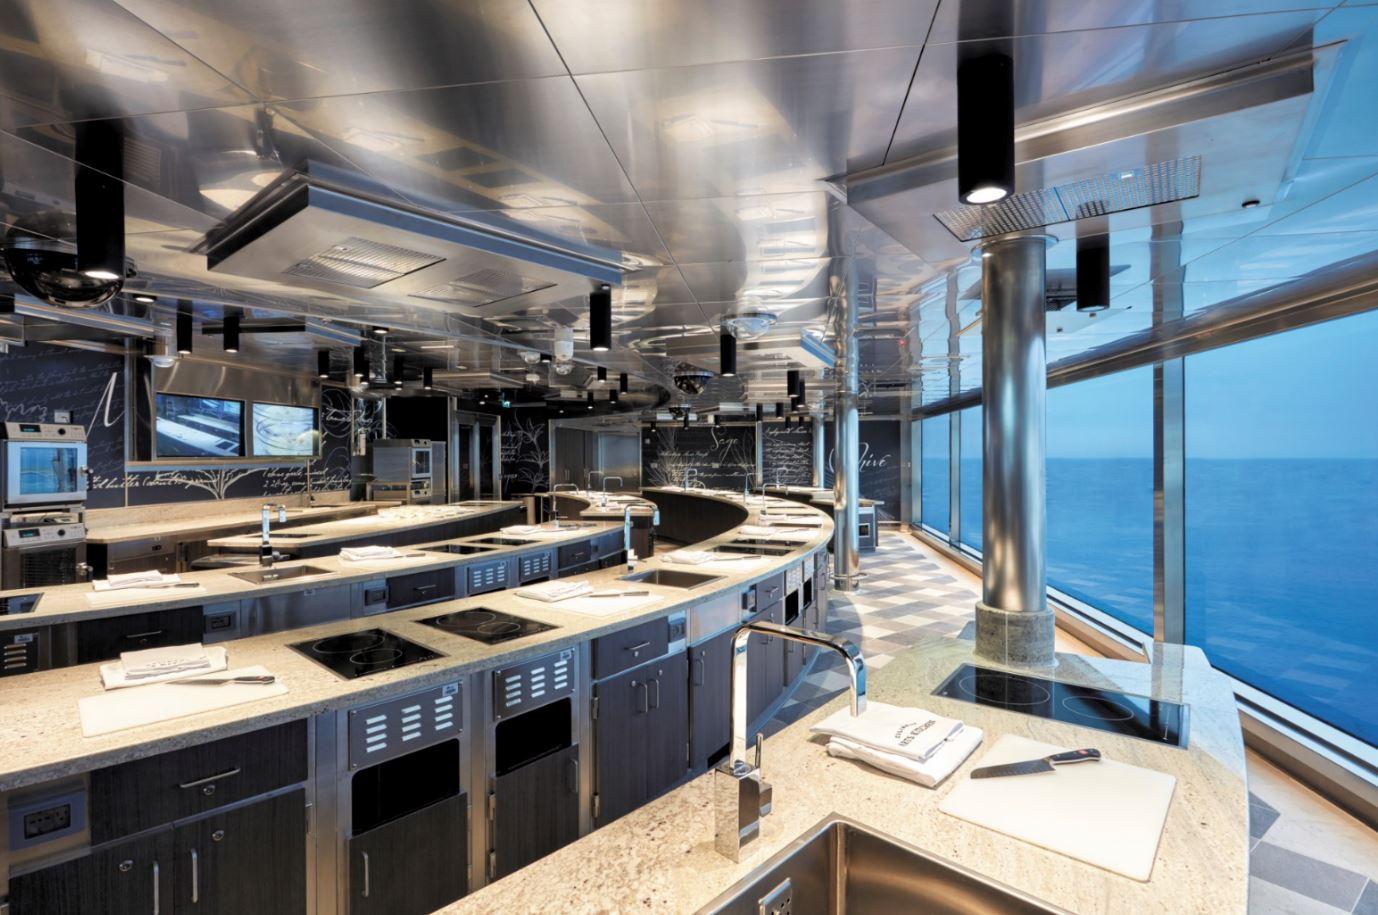 Seven Seas Explorer - Culinary Arts Kitchen Event-Kochschule 2